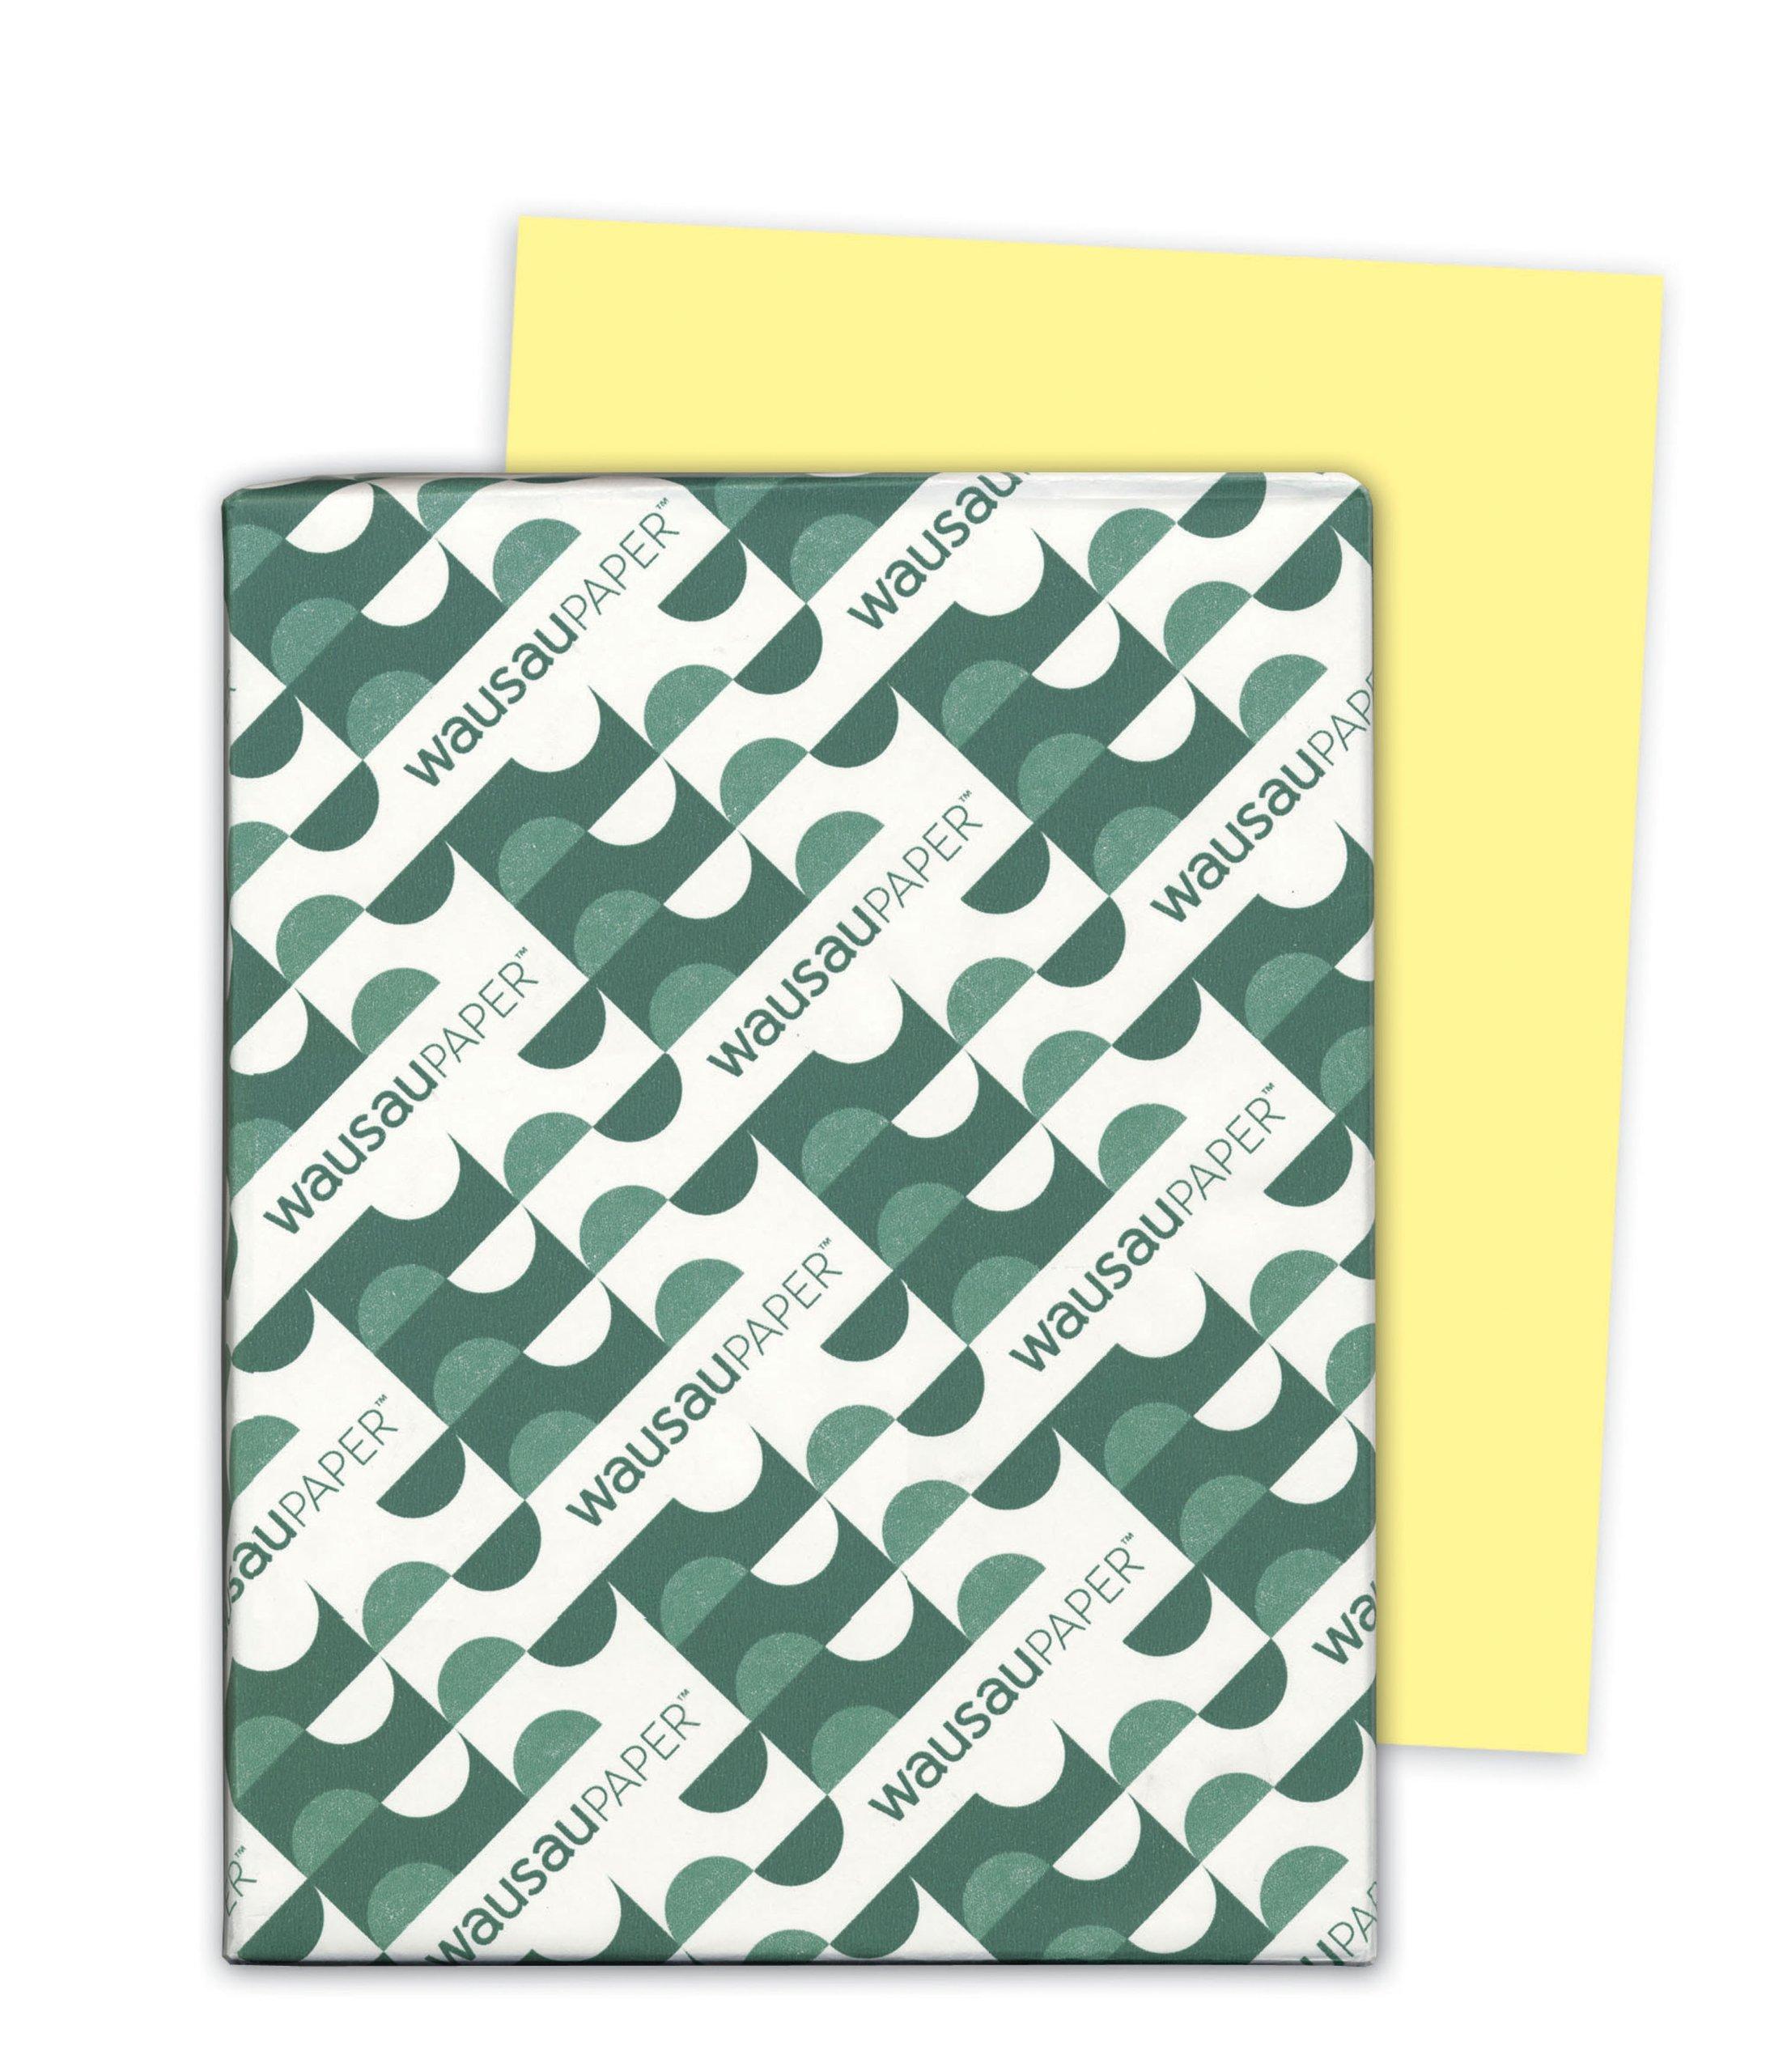 Wausau Exact Multipurpose Paper, 8.5 X 11 Inches, Yellow, 500 Count (32541)